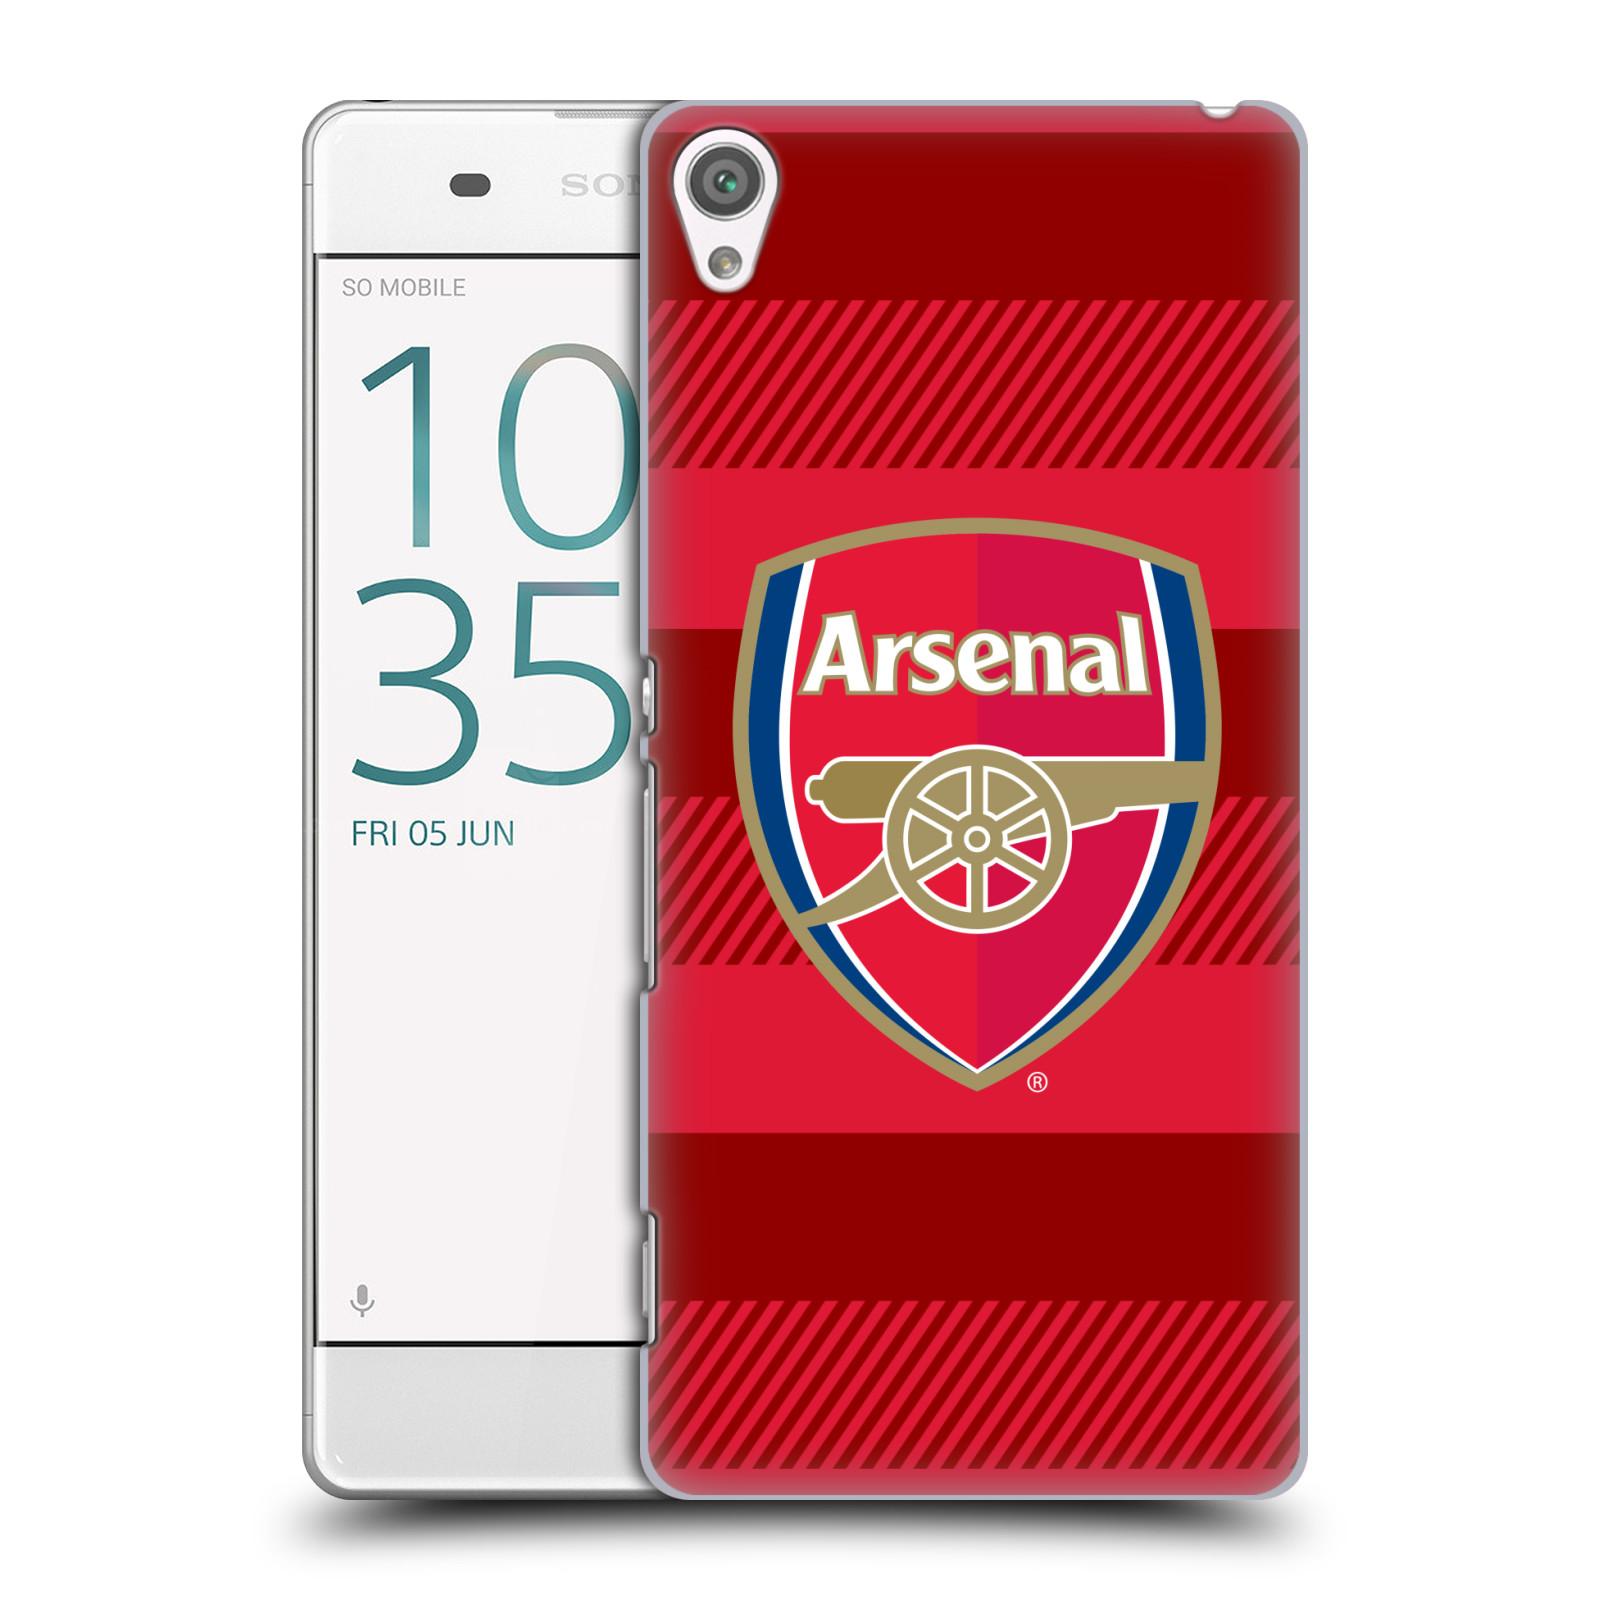 Plastové pouzdro na mobil Sony Xperia XA - Head Case - Arsenal FC - Logo s pruhy